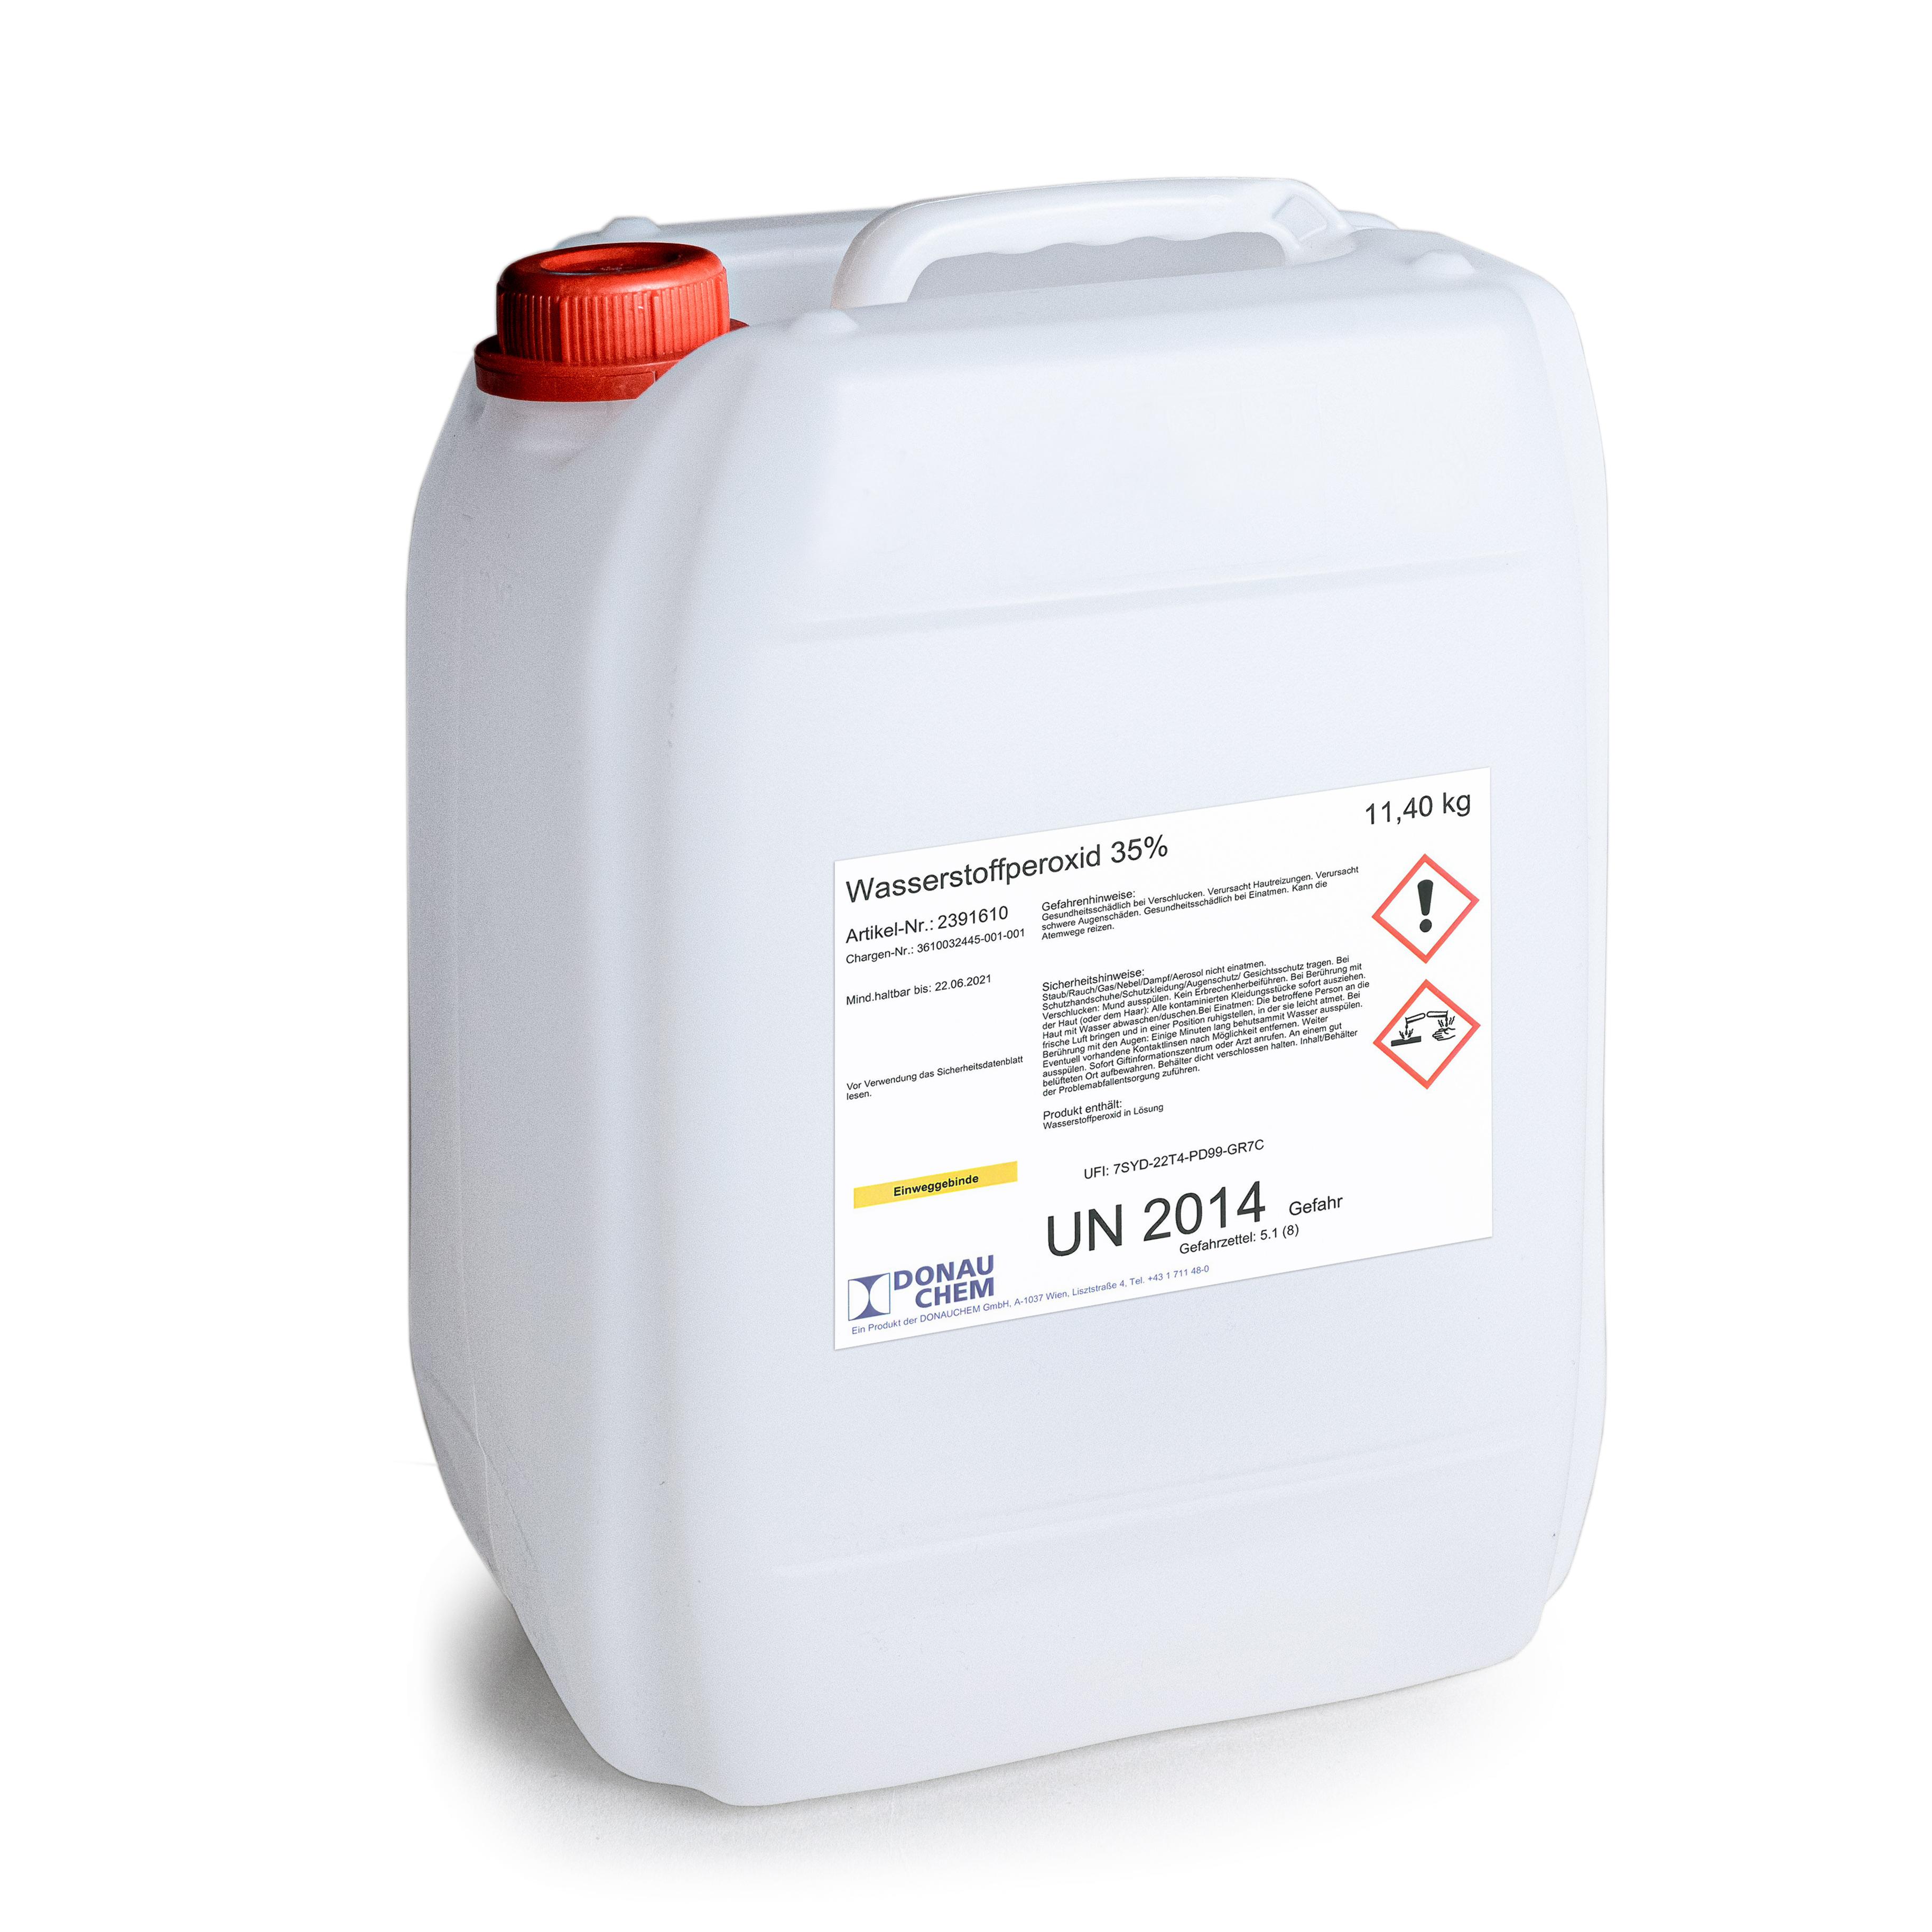 Wasserstoffperoxid 35%